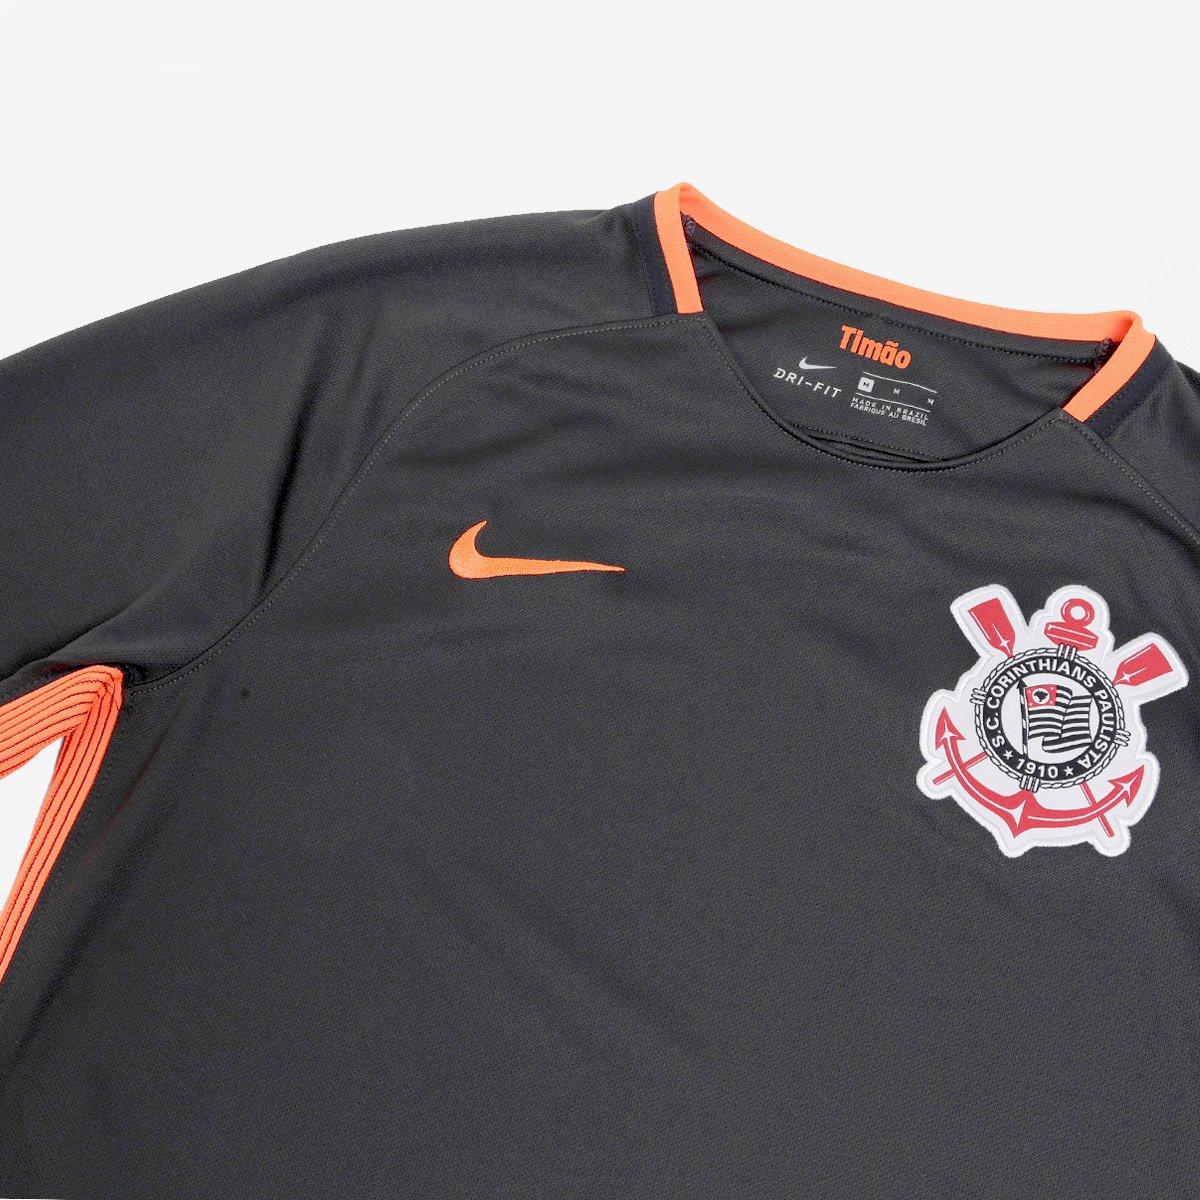 e3c001a3ce Camisa Corinthians III 17 18 s n° - Torcedor Nike Masculina ...